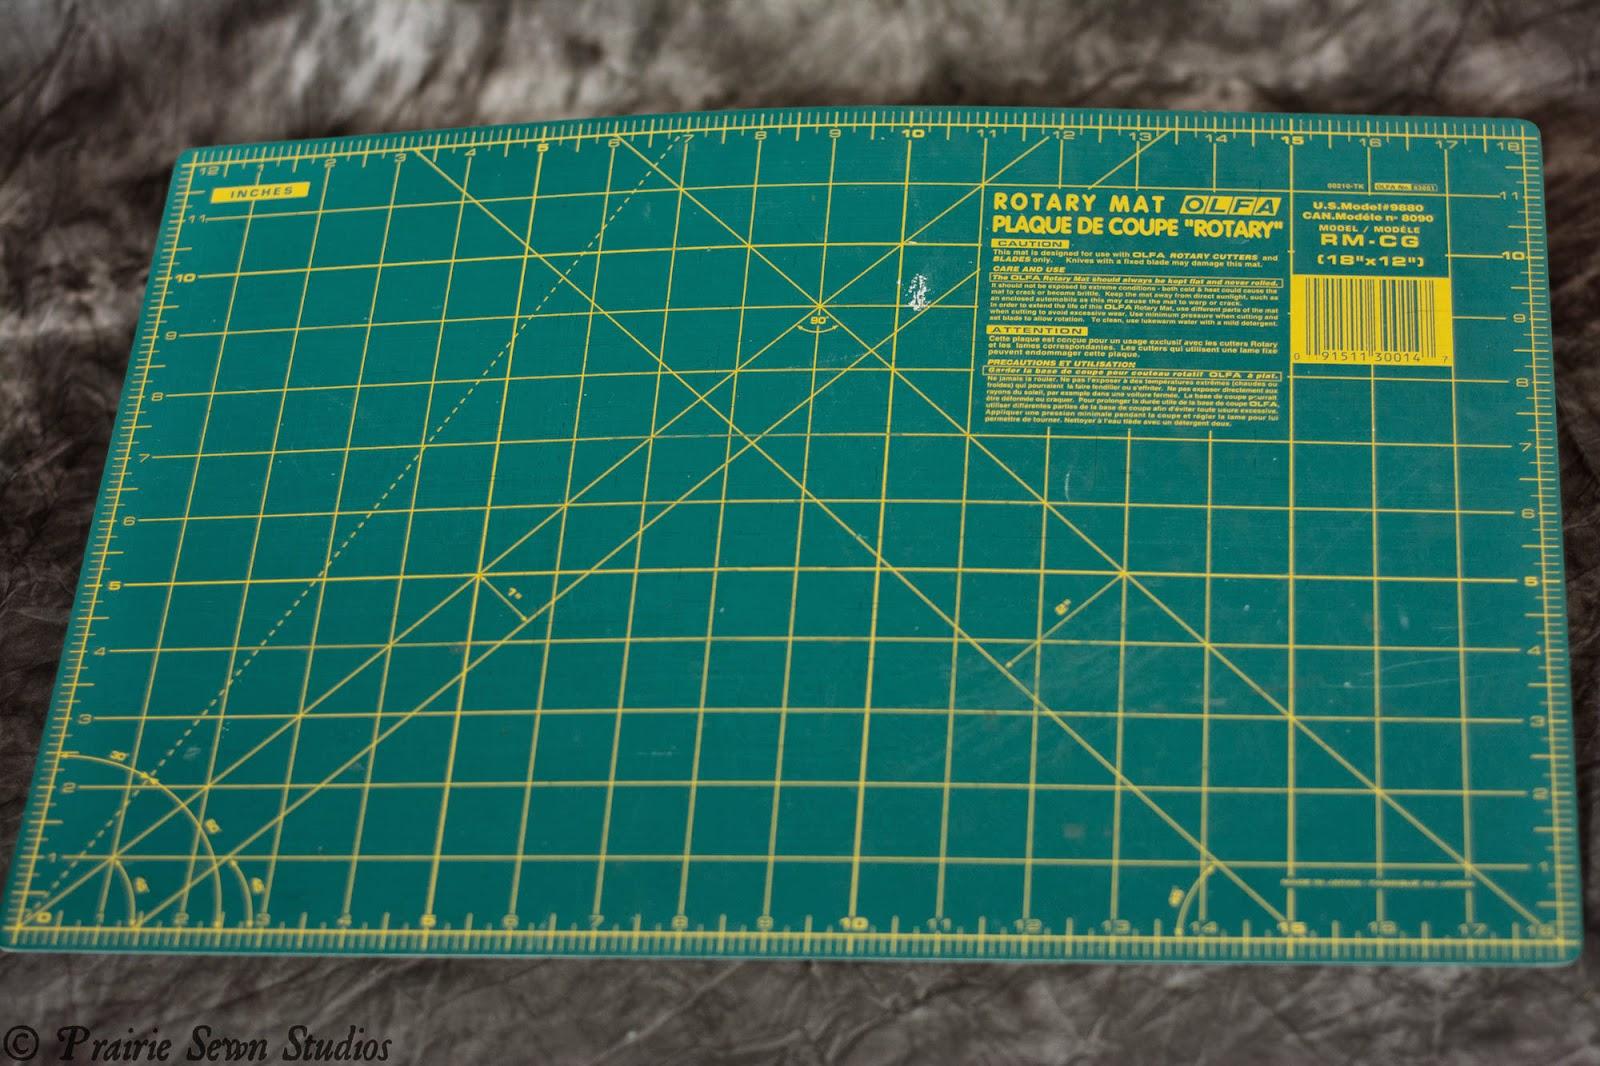 prairie sewn studios selfhealing cutting mat  quilter's tool, Kitchen design